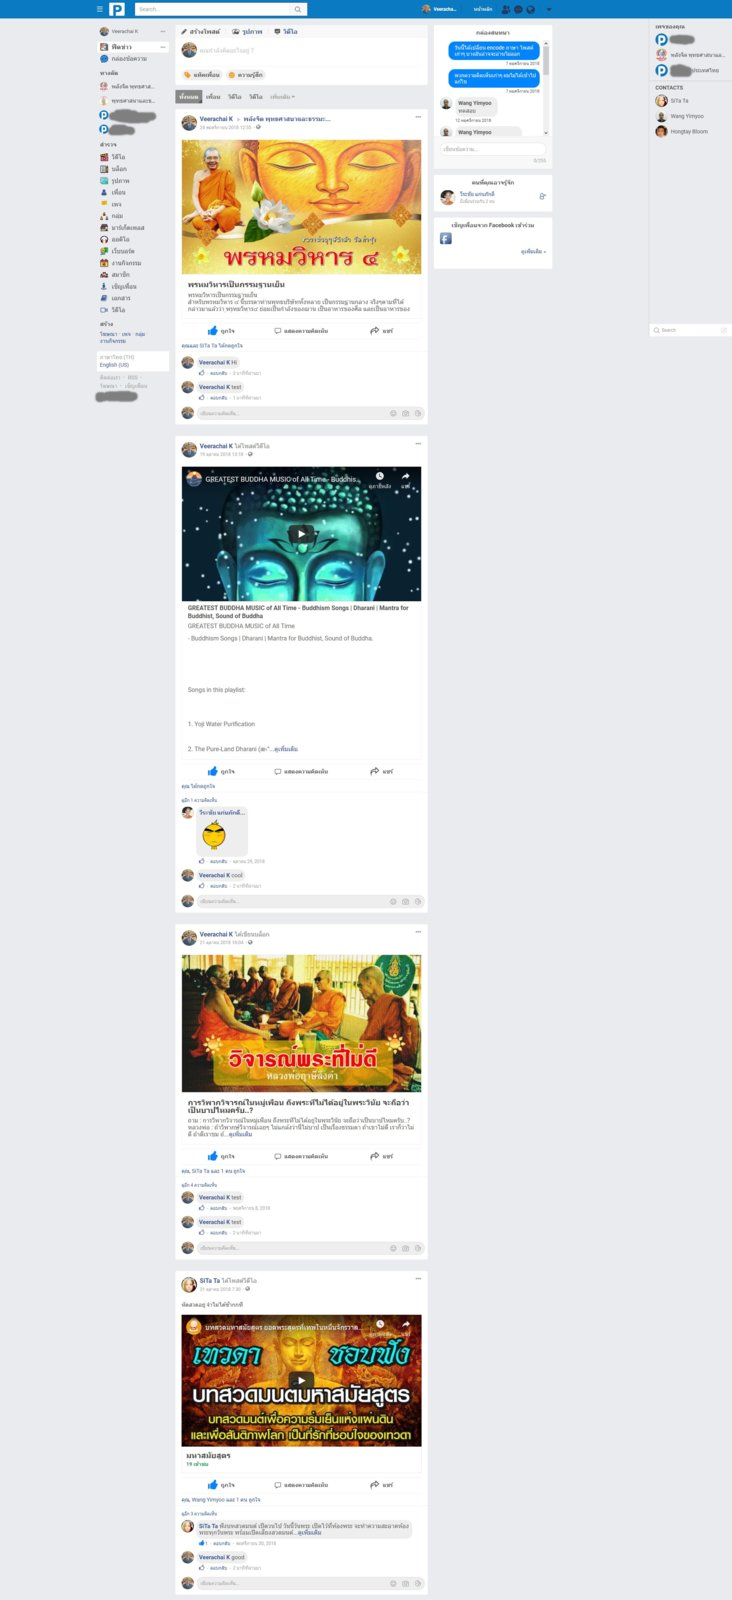 Screenshot_2018-12-25 พลังจิต พุทธศาสนาและธรรมะ(1).jpg